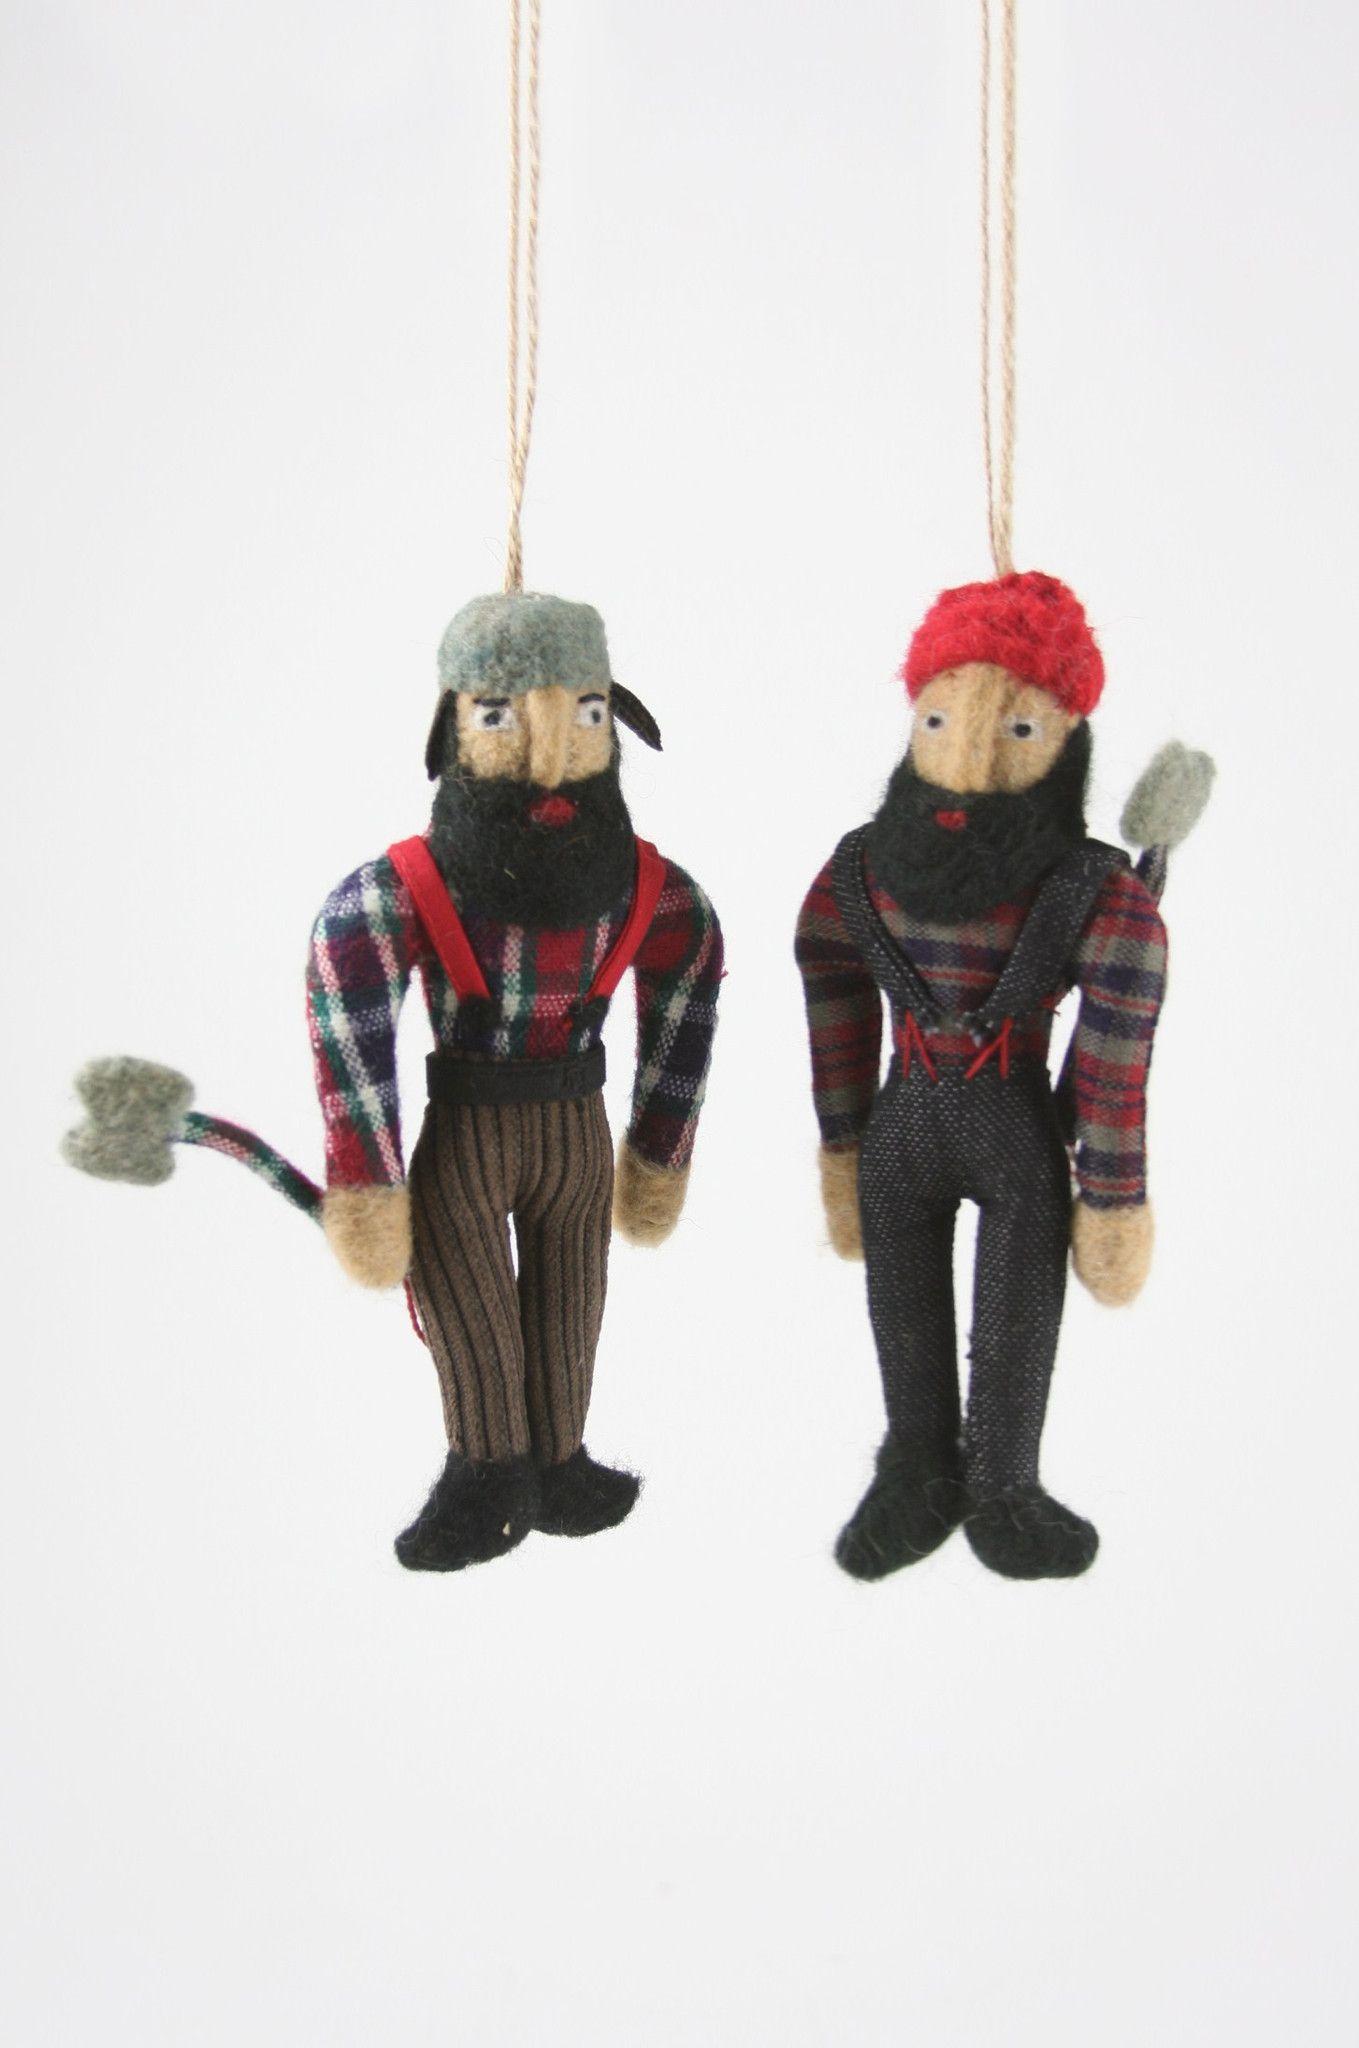 Lumberjack Dolls Christmas Ornaments  Christmas ornament sets